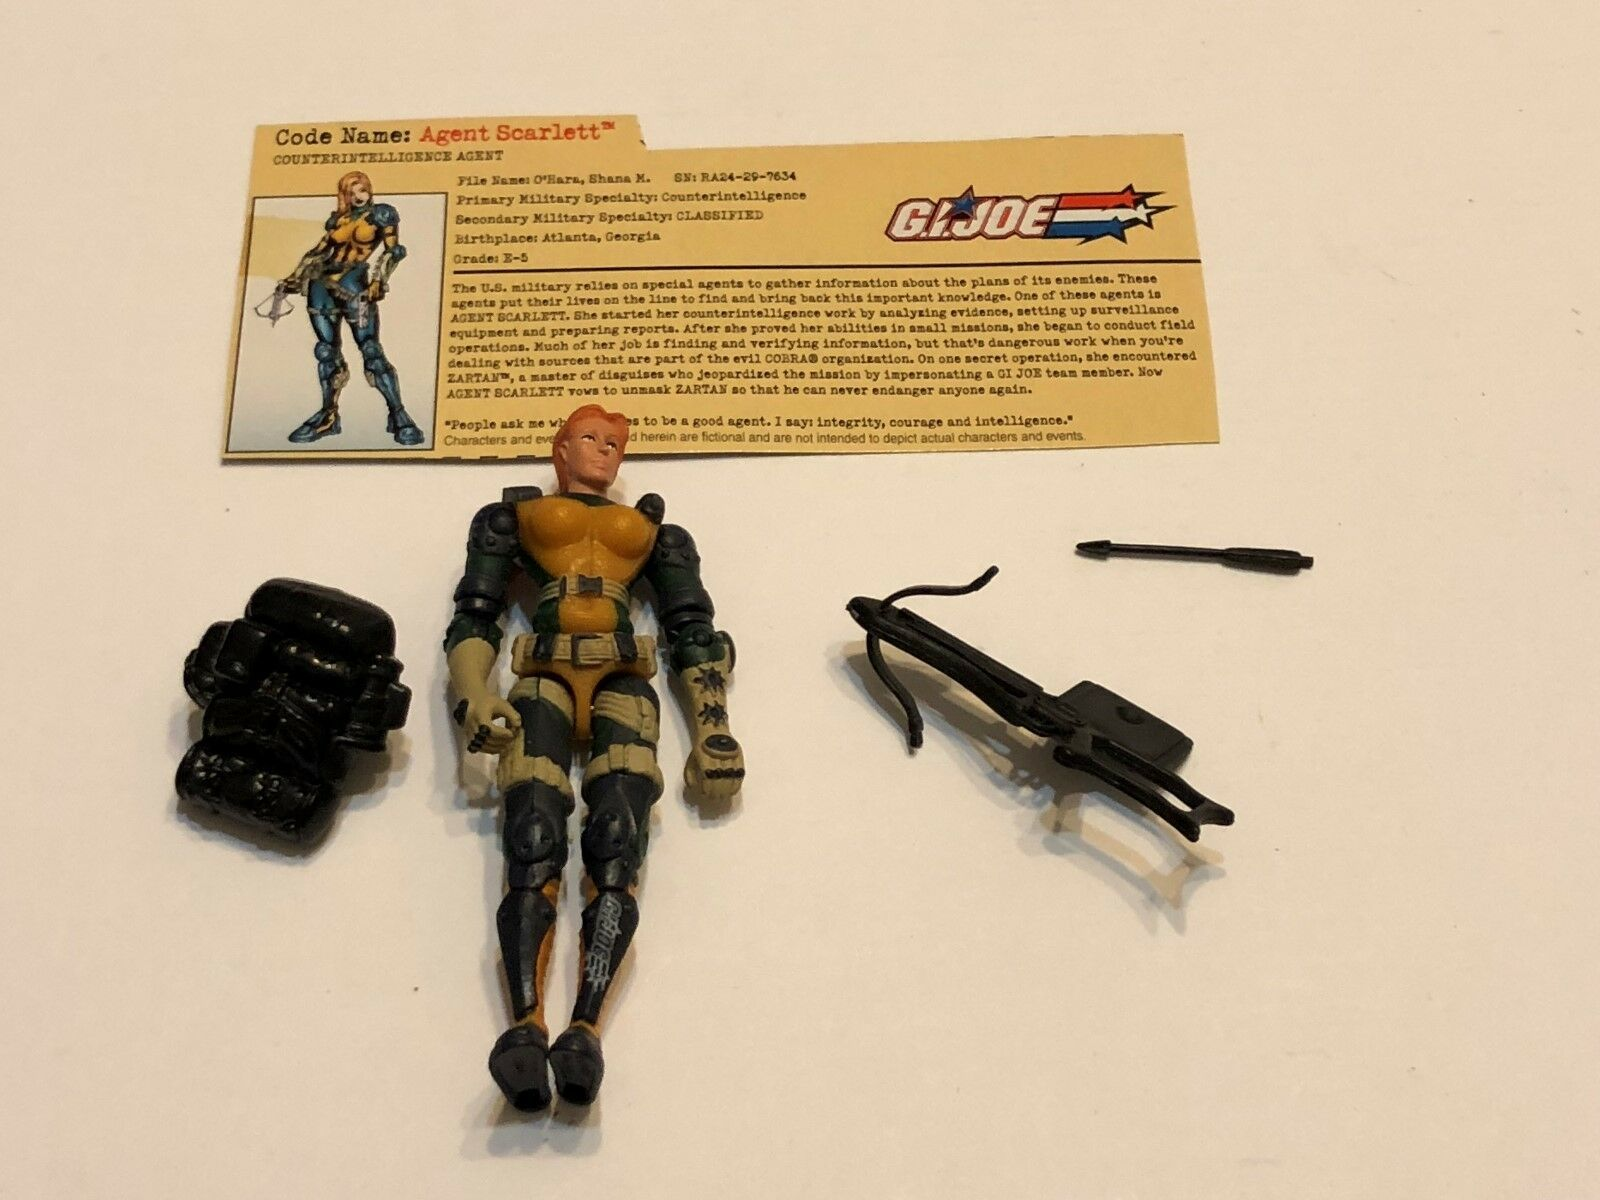 2002 G.I. JOE Action Figure Agent Scarlett ( Ref # 4-14 )